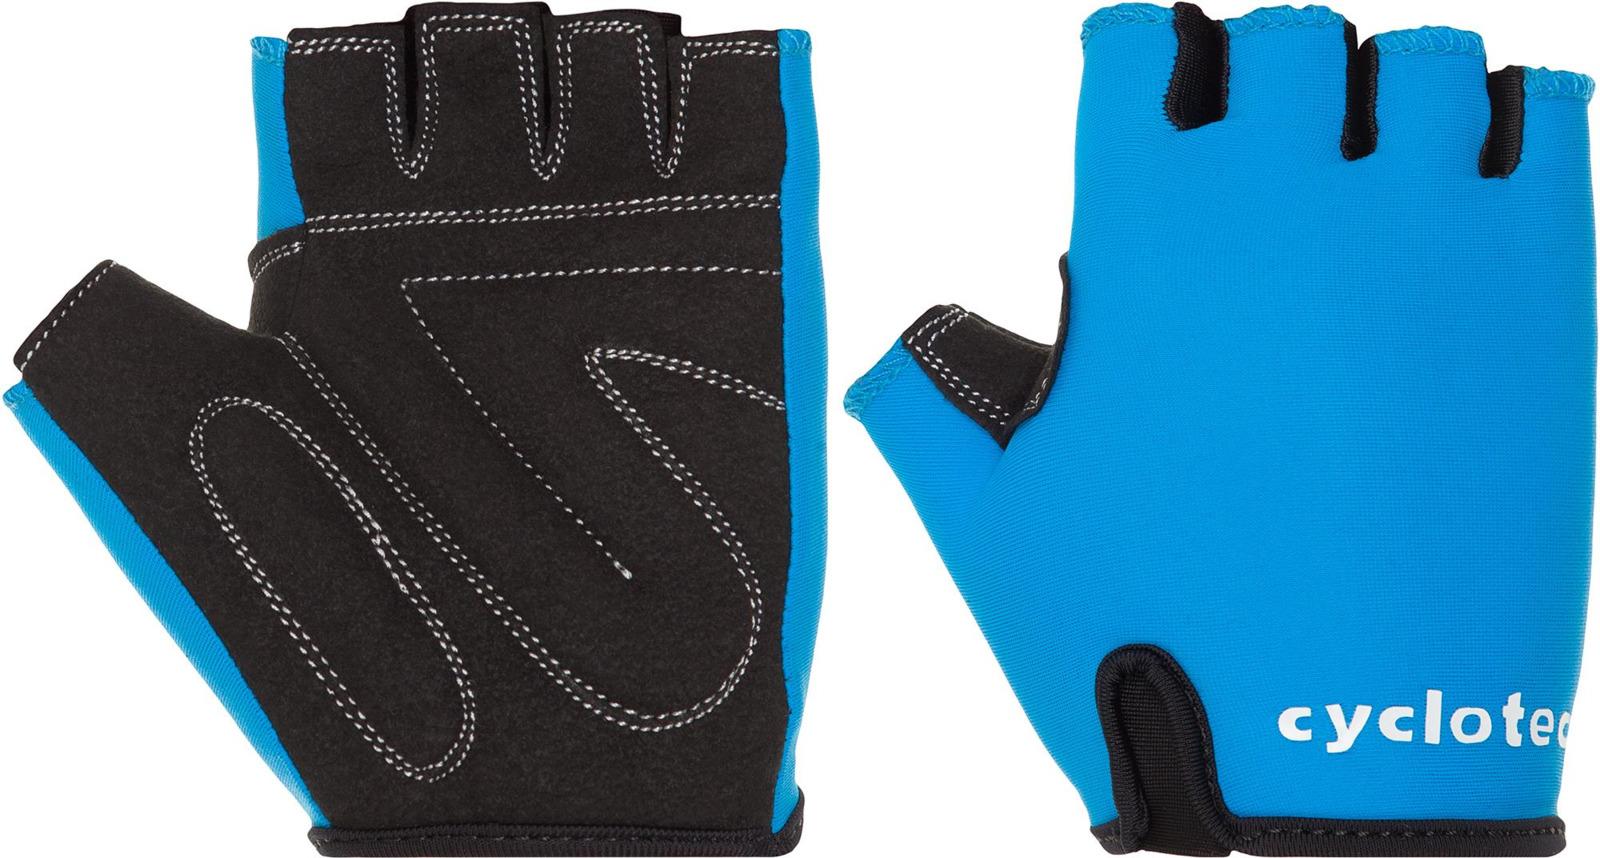 Велоперчатки Cyclotech WIND-B Bike gloves, синий, черный, размер M